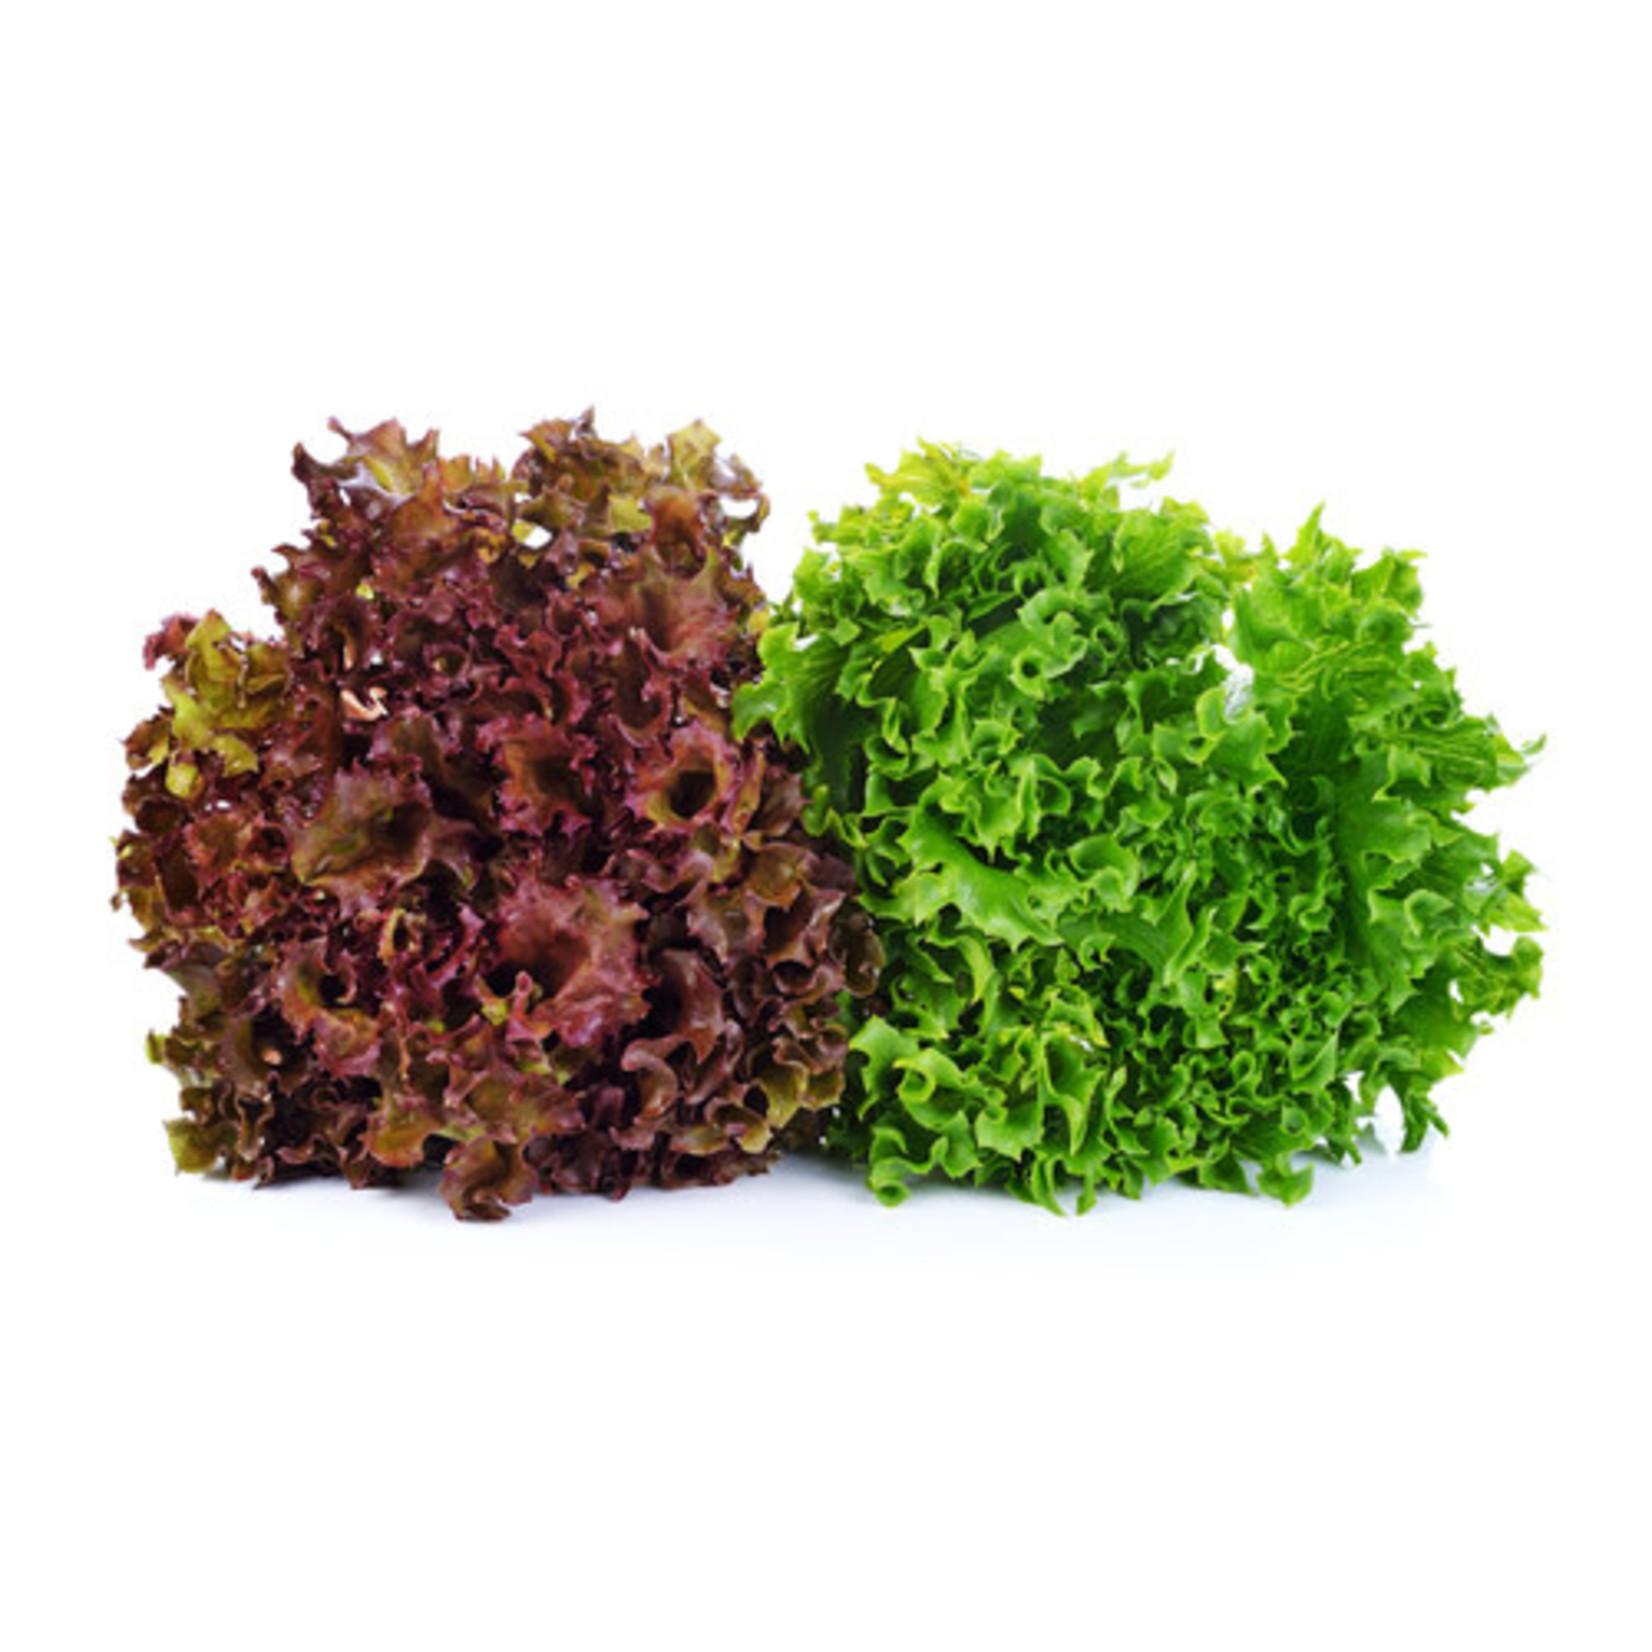 Leaf Lettuce (seed pkg)